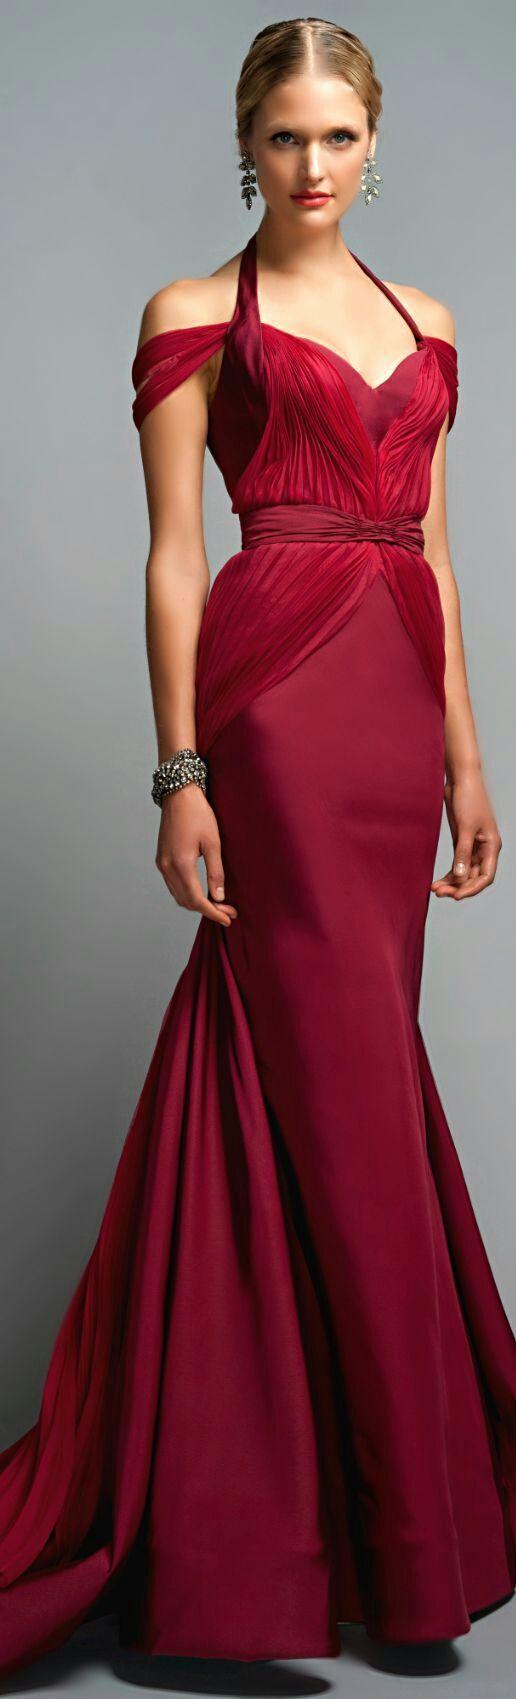 Pin auf Trauzeuginkleid/Brautjungferkleid